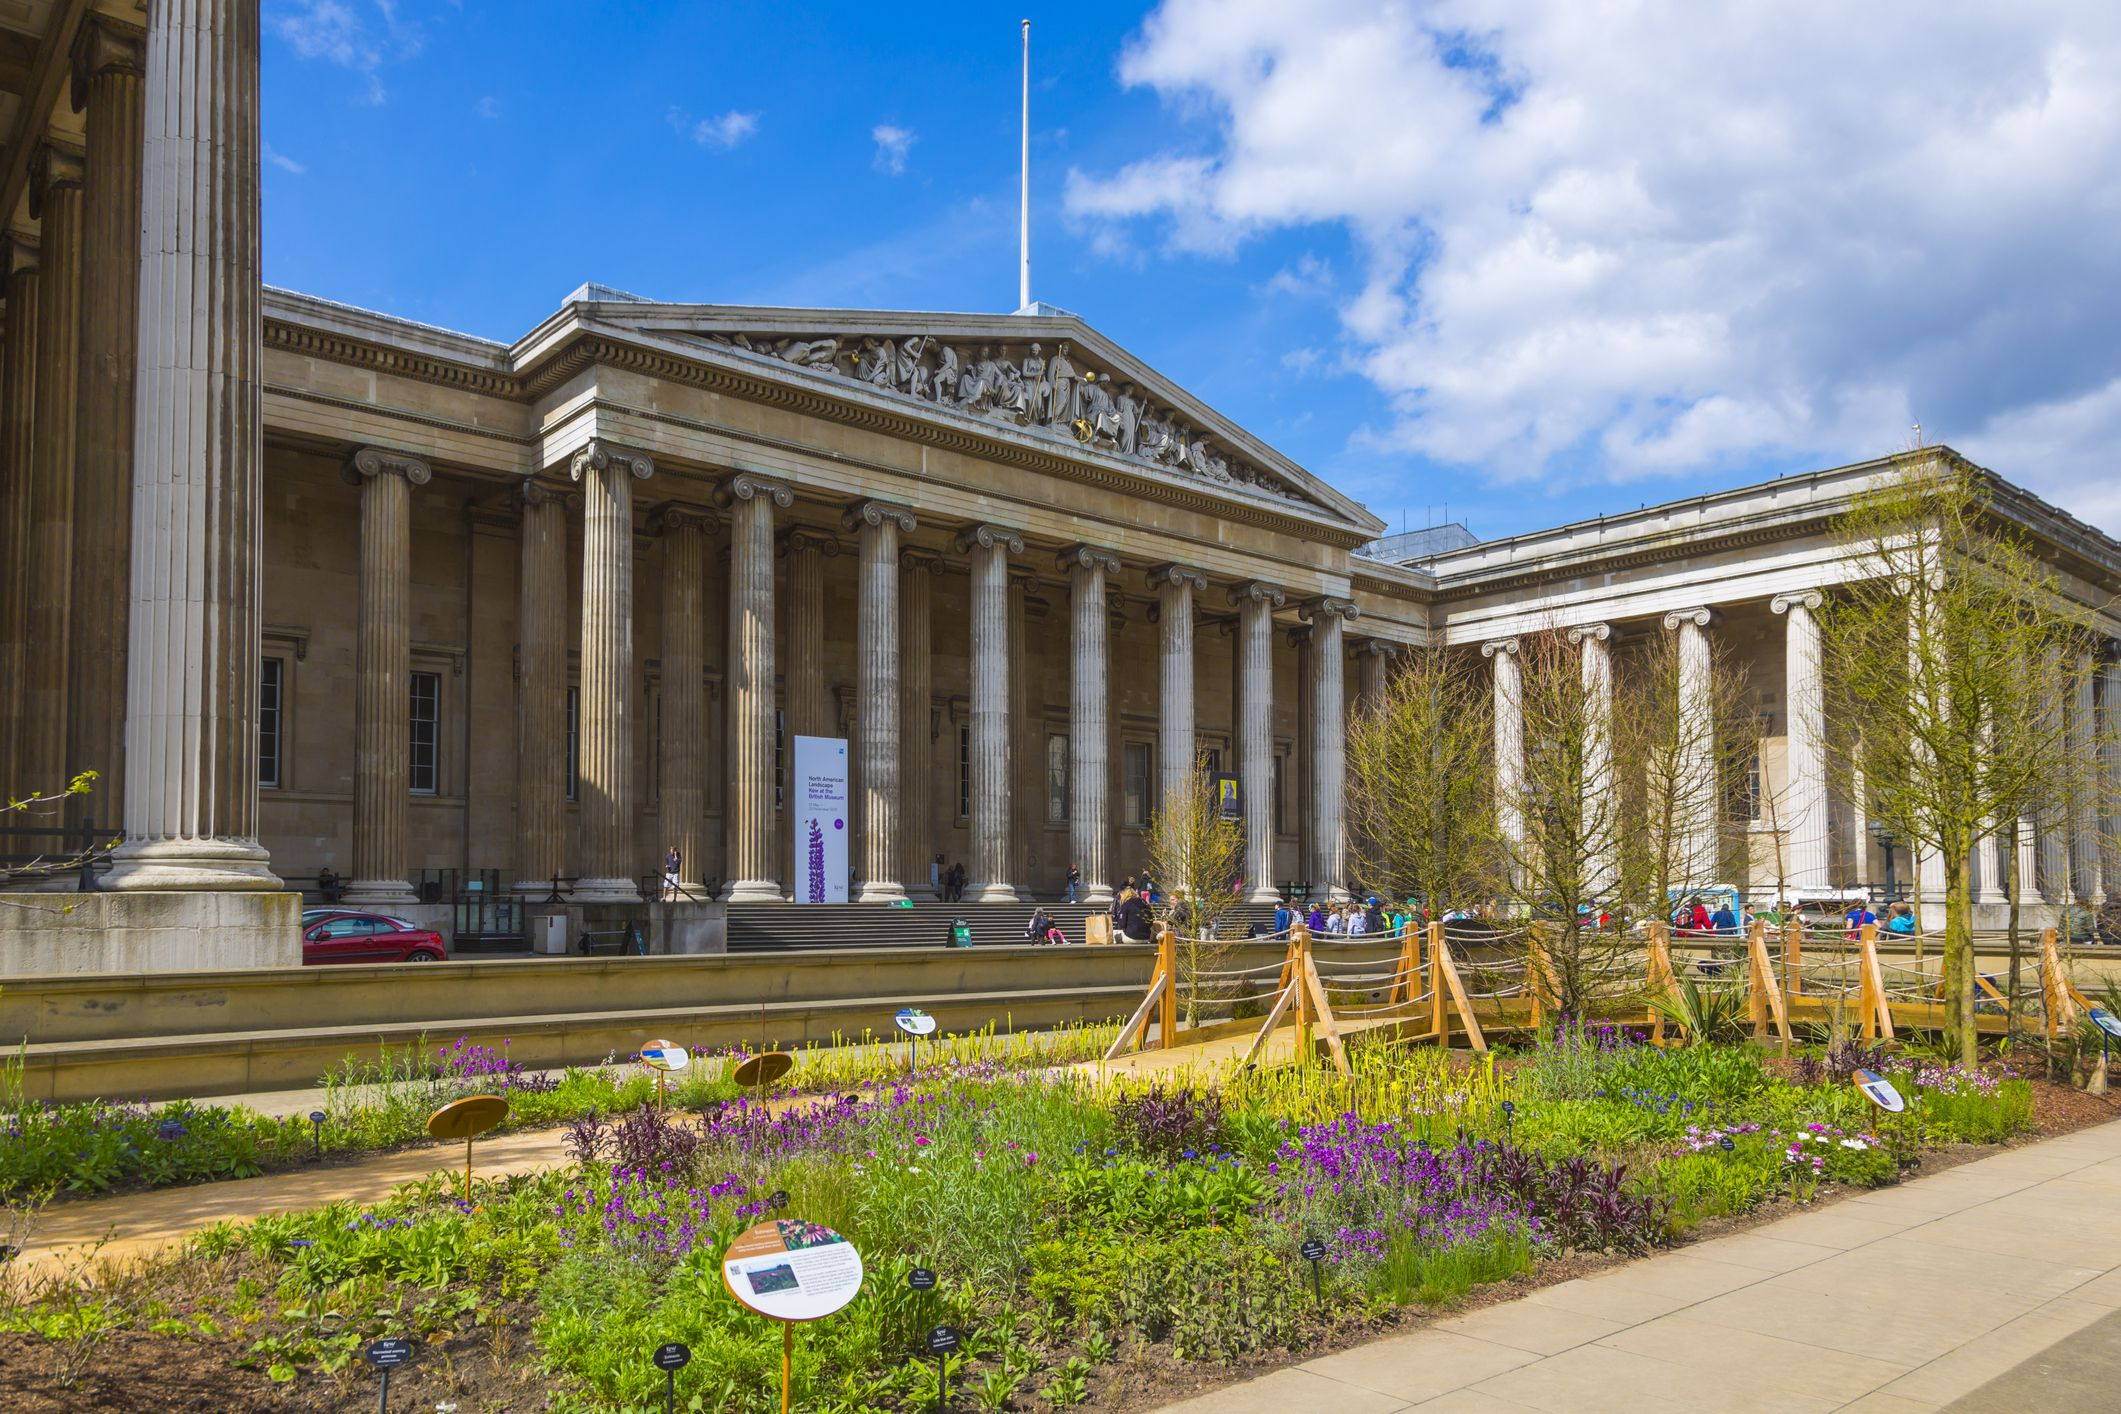 London's 10 Best Museums